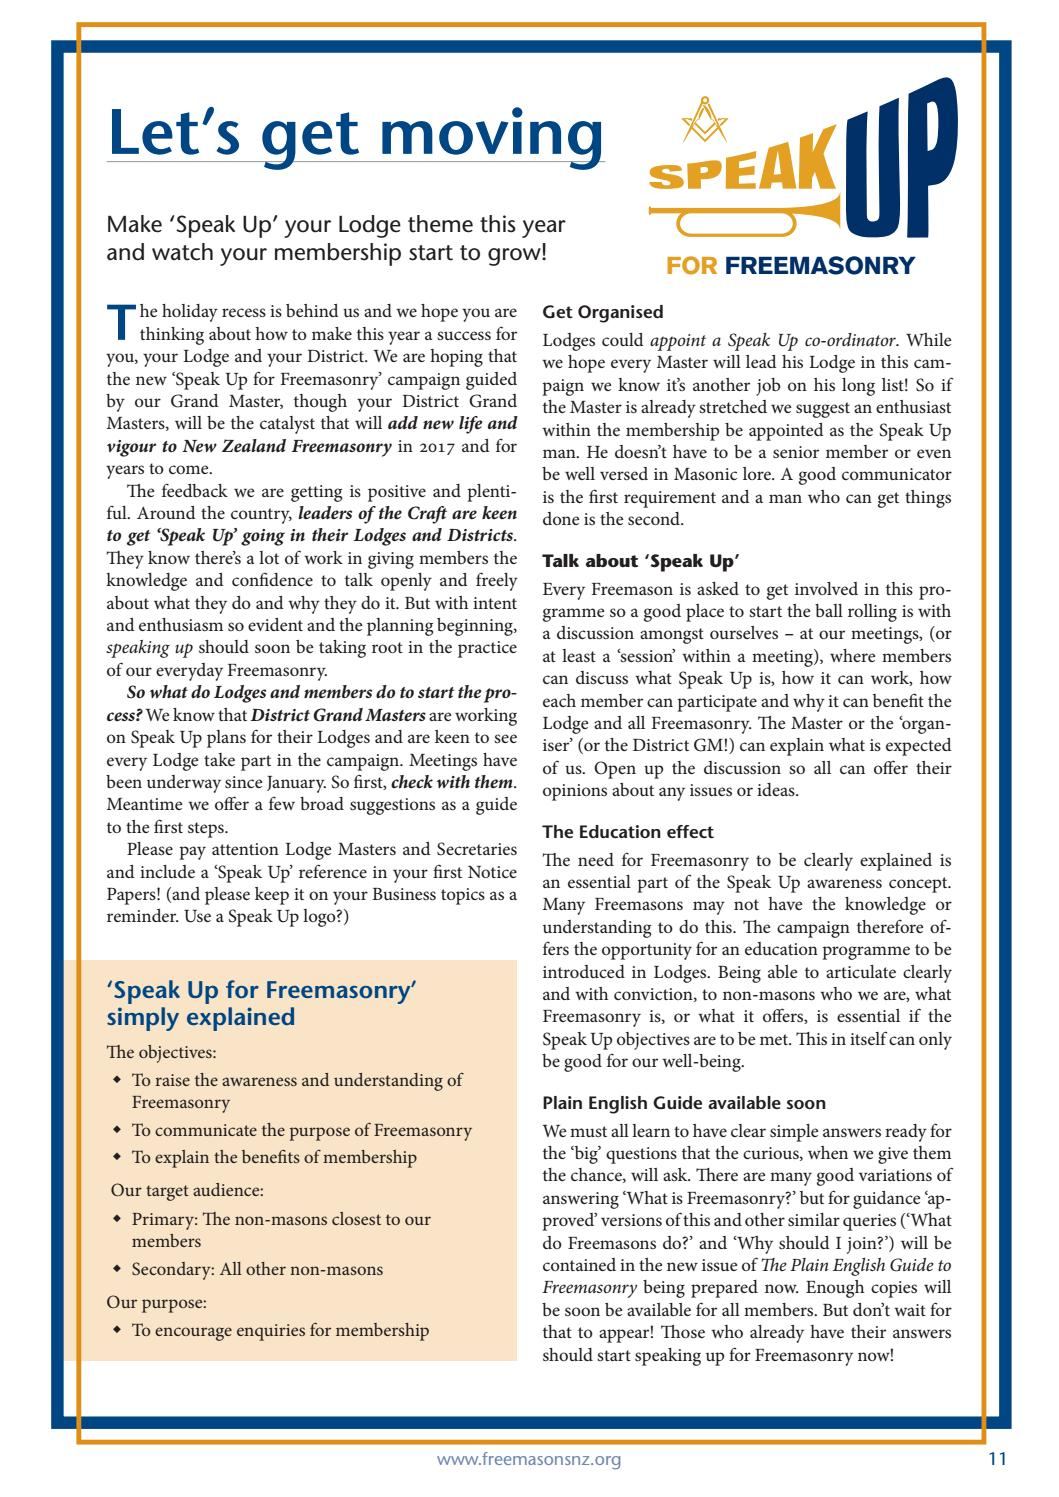 NZ Freemason magazine Issue 1 March 2017 by Freemasons New Zealand